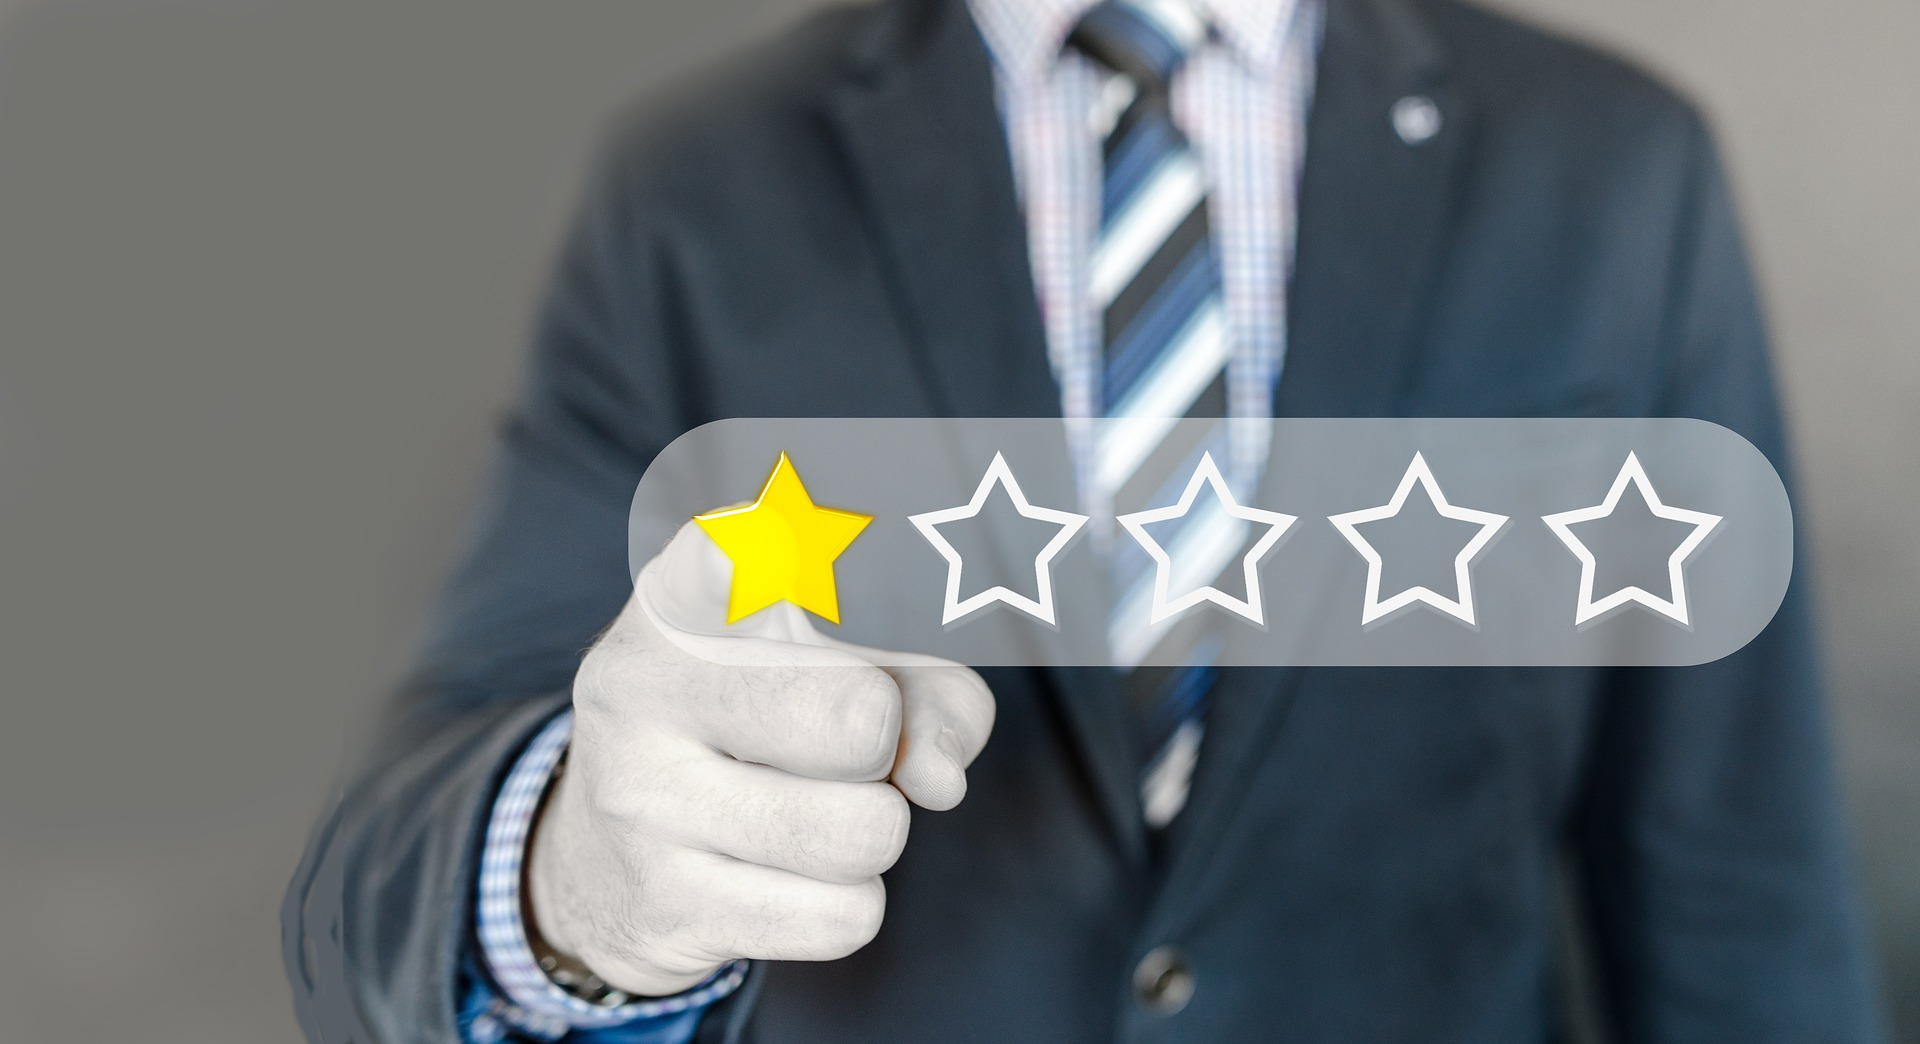 Google reviews stars